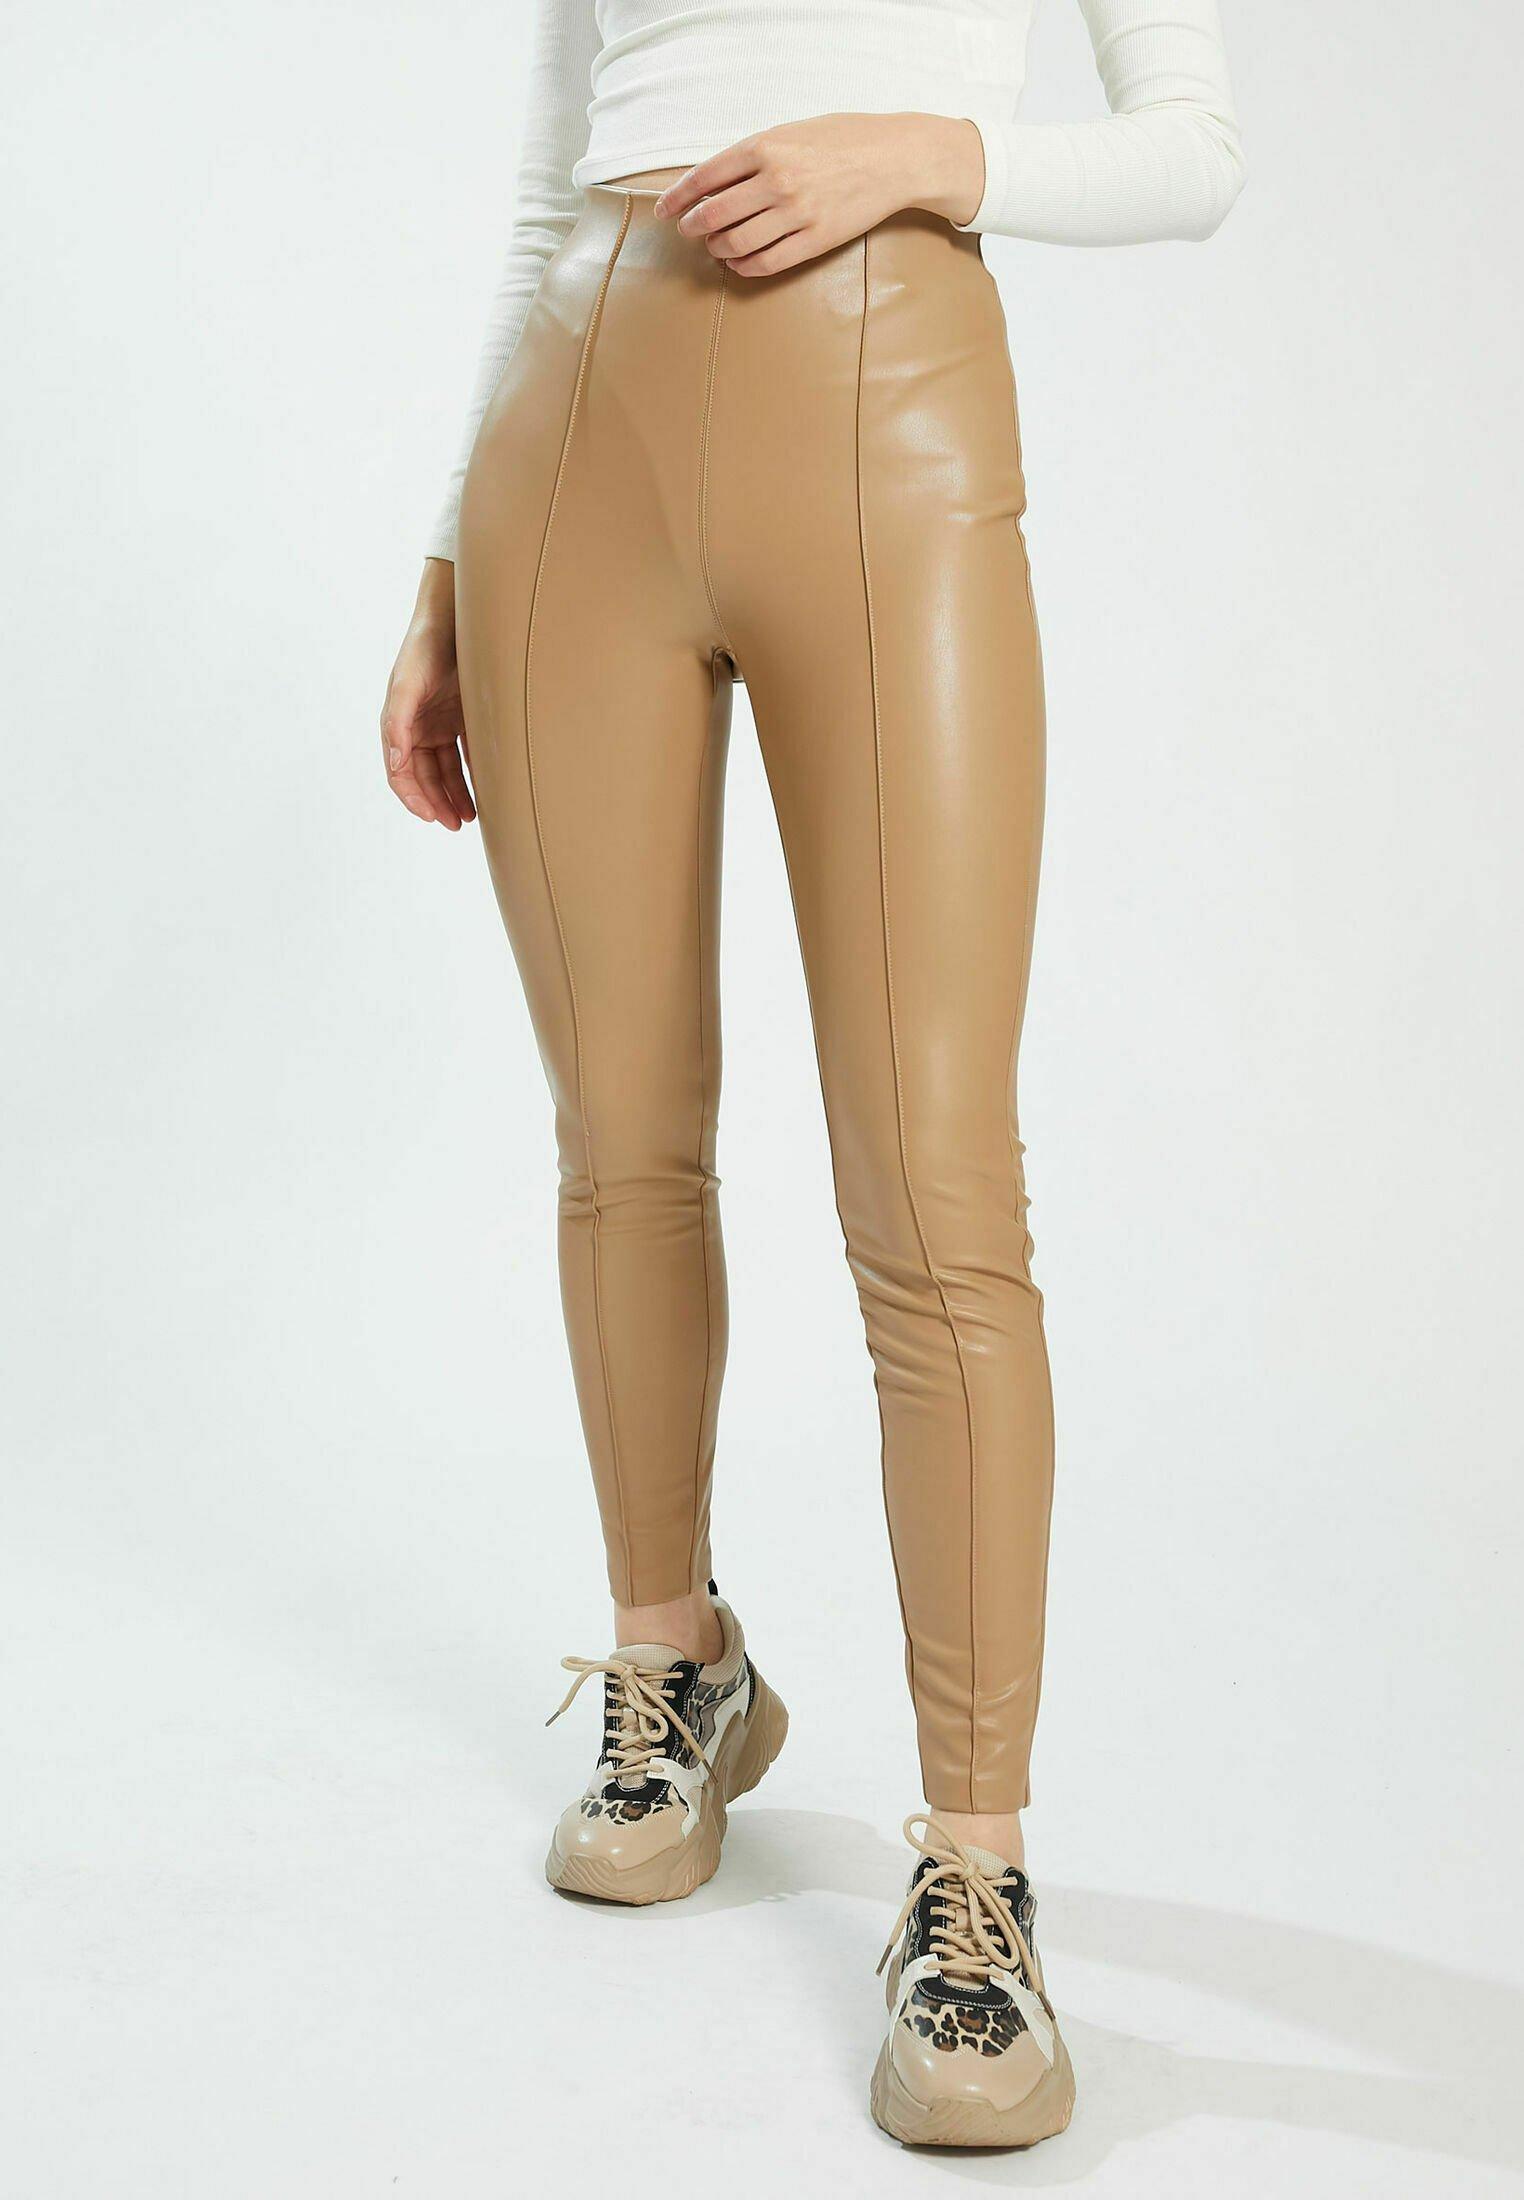 Damen AUS - Leggings - Hosen